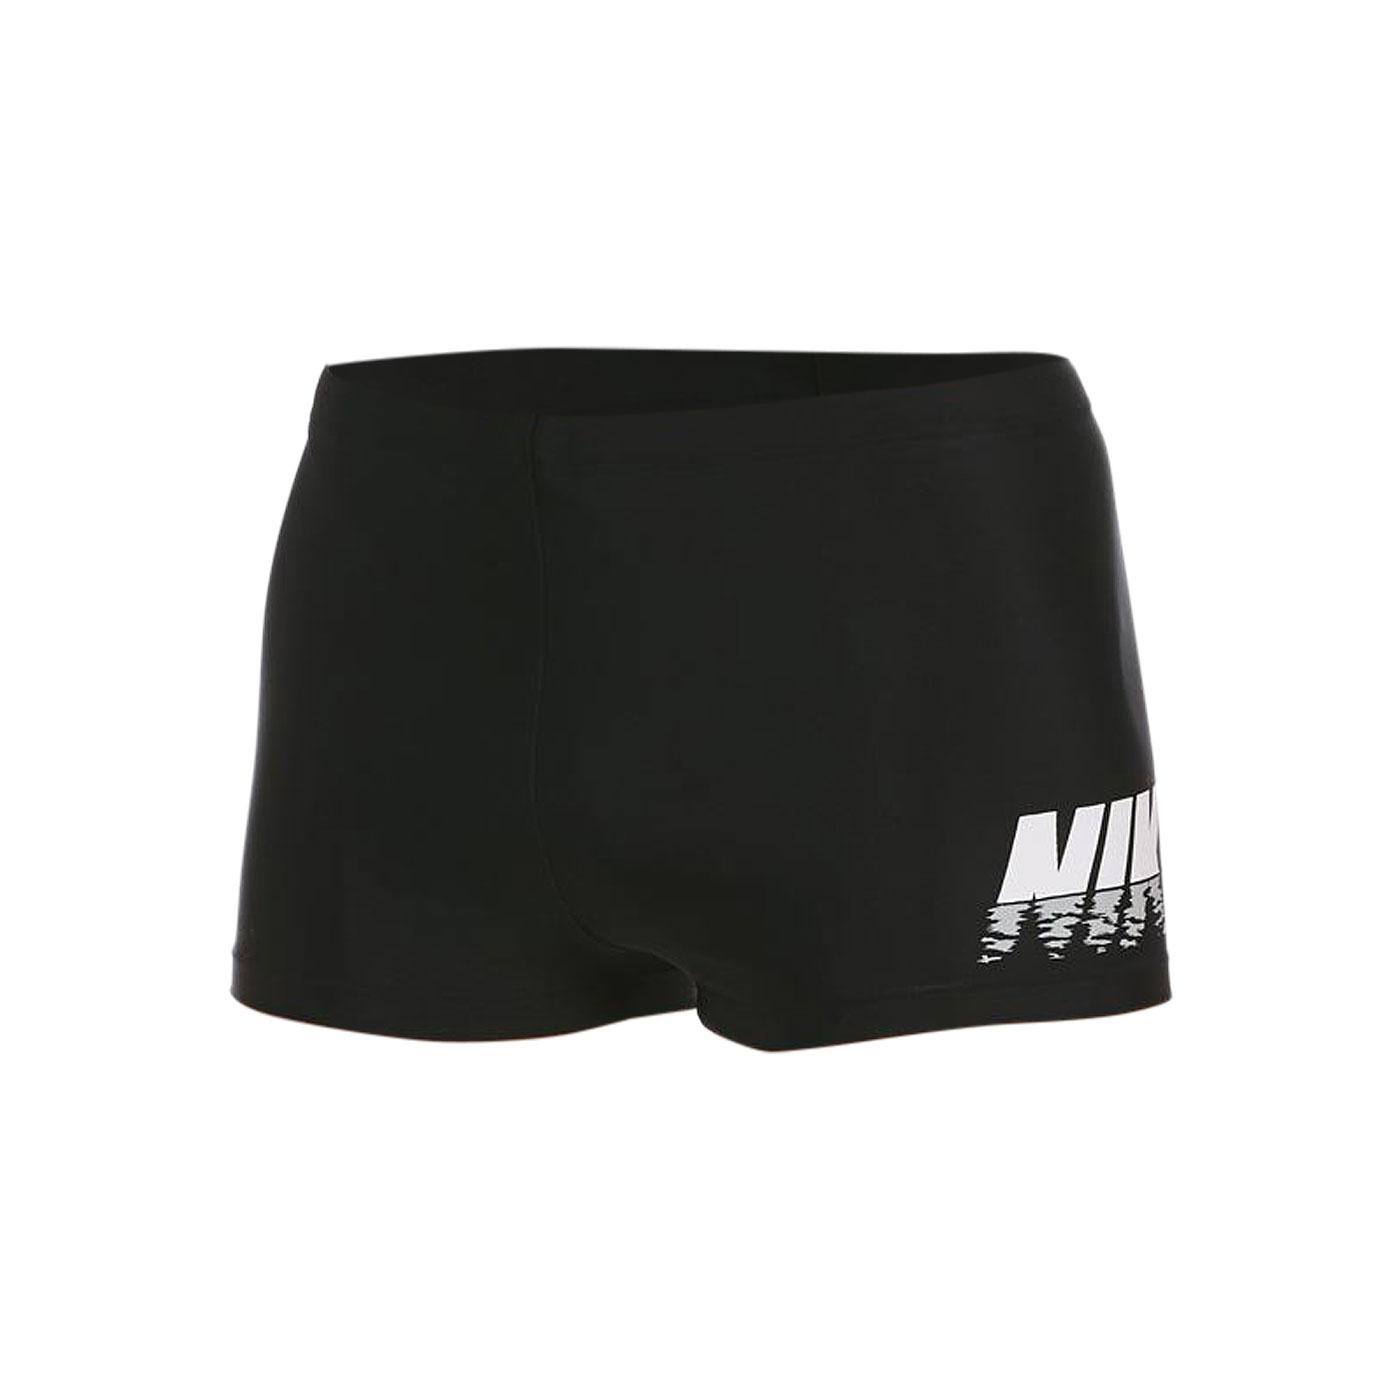 NIKE SWIM 成人男性四角泳褲 NESSB566-001